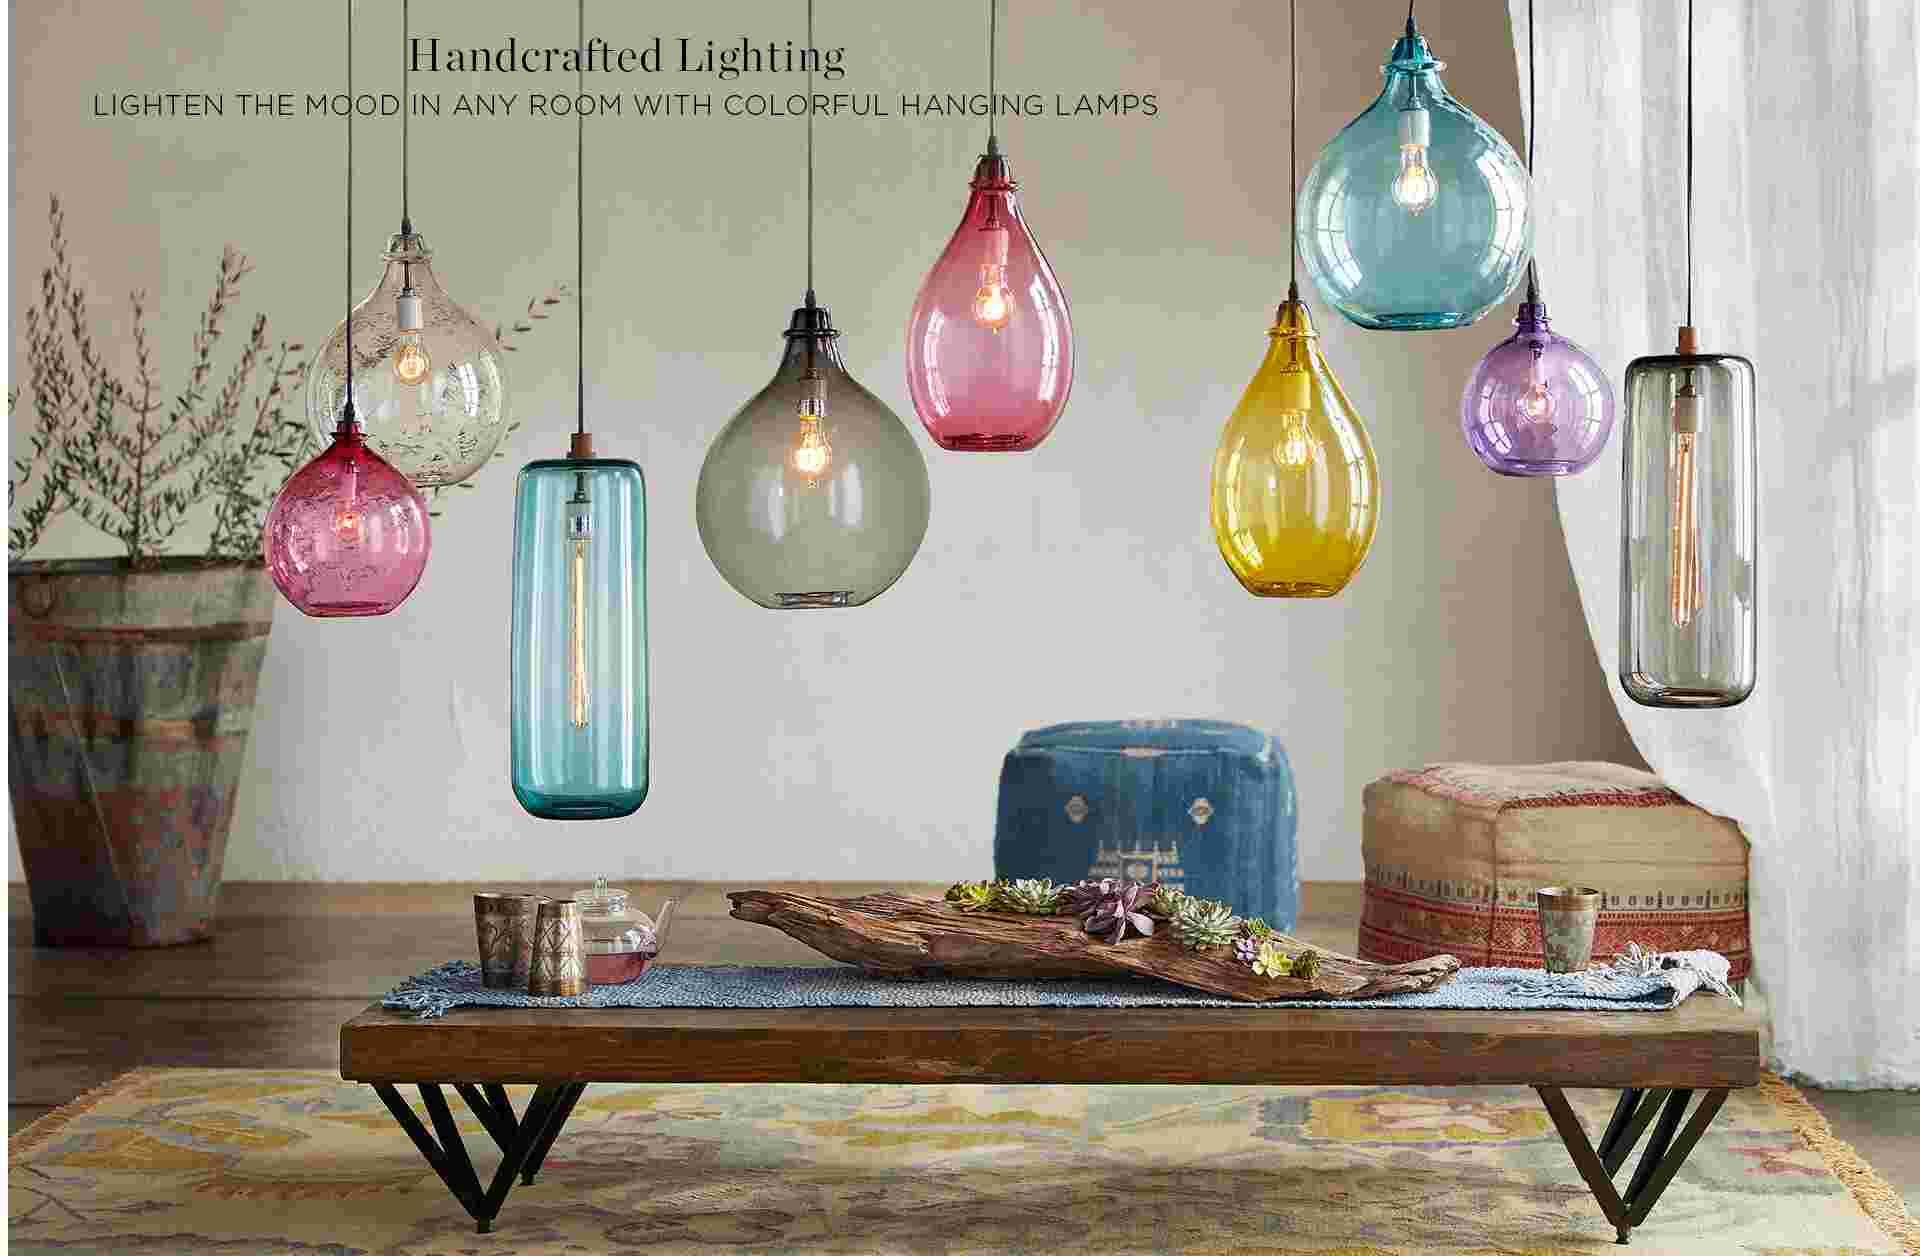 Handcrafted Lighting